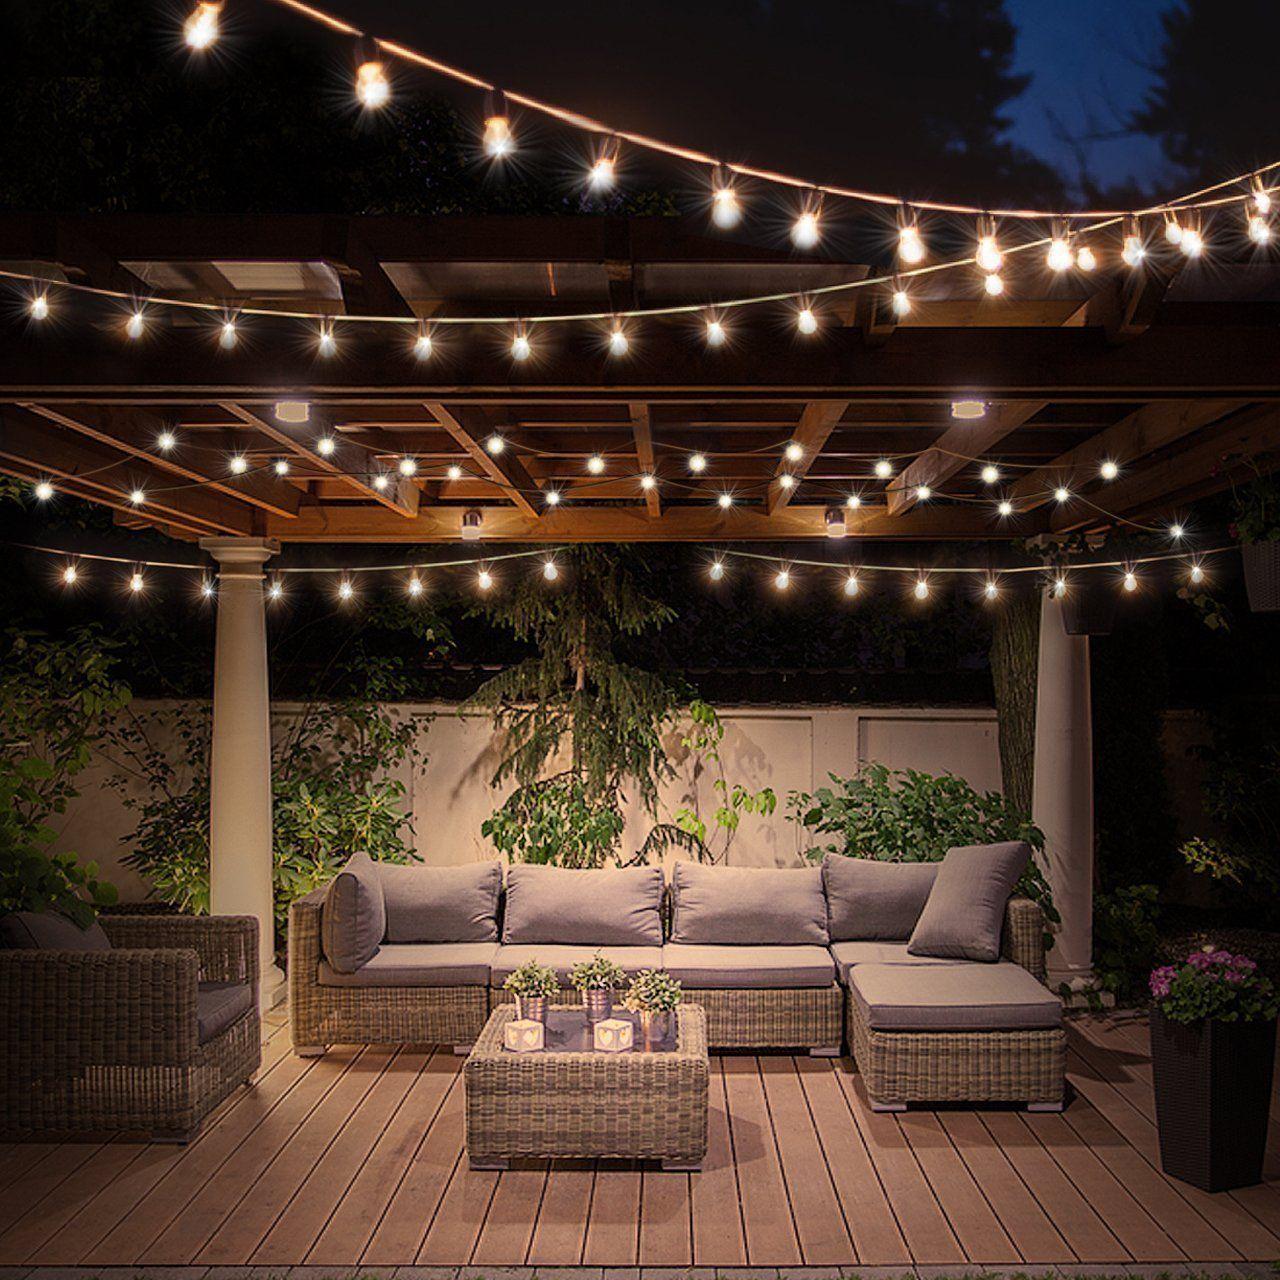 53 Reference Of Edison Patio Lights Amazon In 2020 Terrassen Deko Terassenentwurf Terassenideen